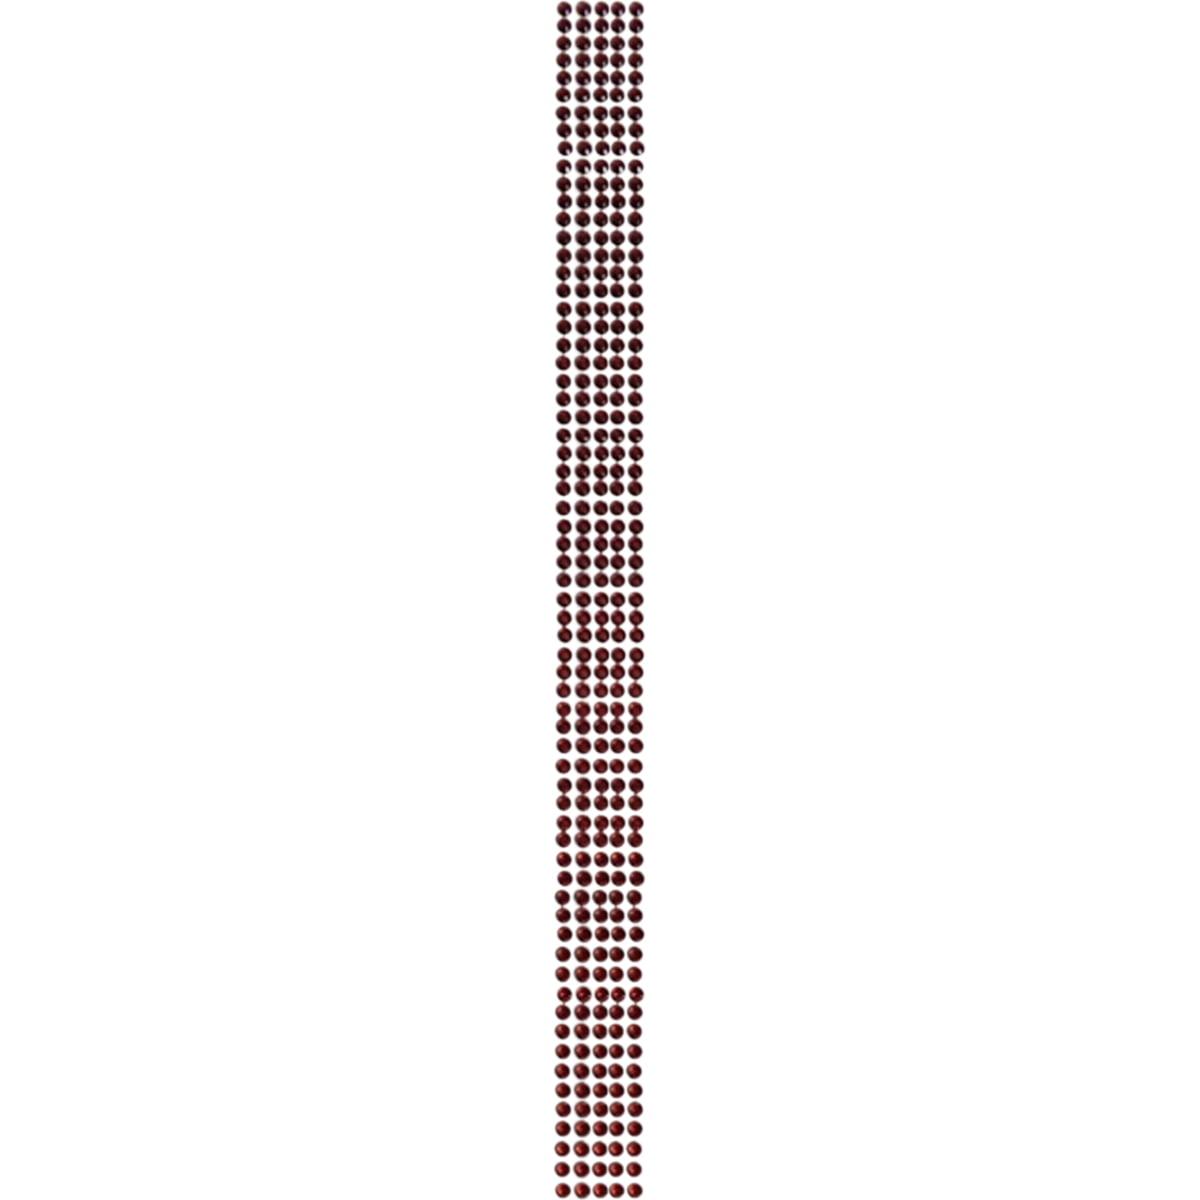 "Want2scrap Want2Scrap Self-Adhesive Sleek Strips Bling 4mm 12""-Red Rhinestones"